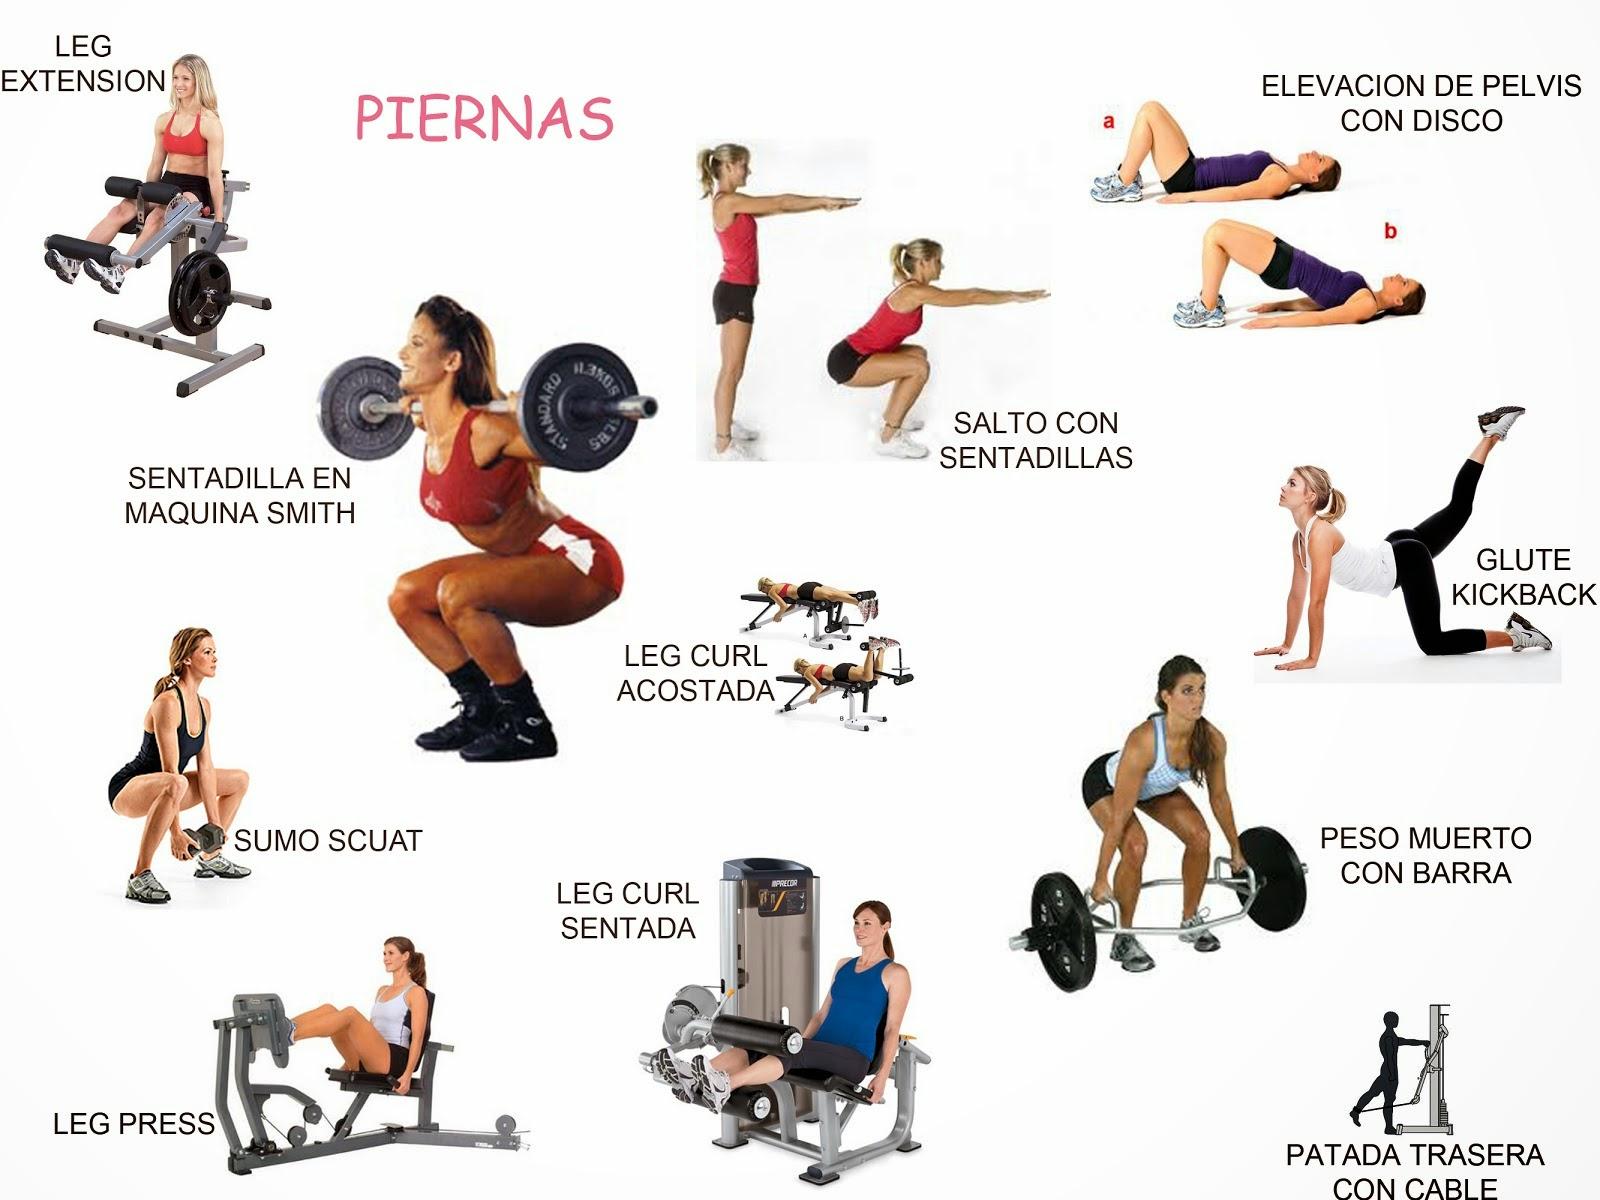 100 fitness y entrenamiento deportivo mayo 2015 for Rutina fitness